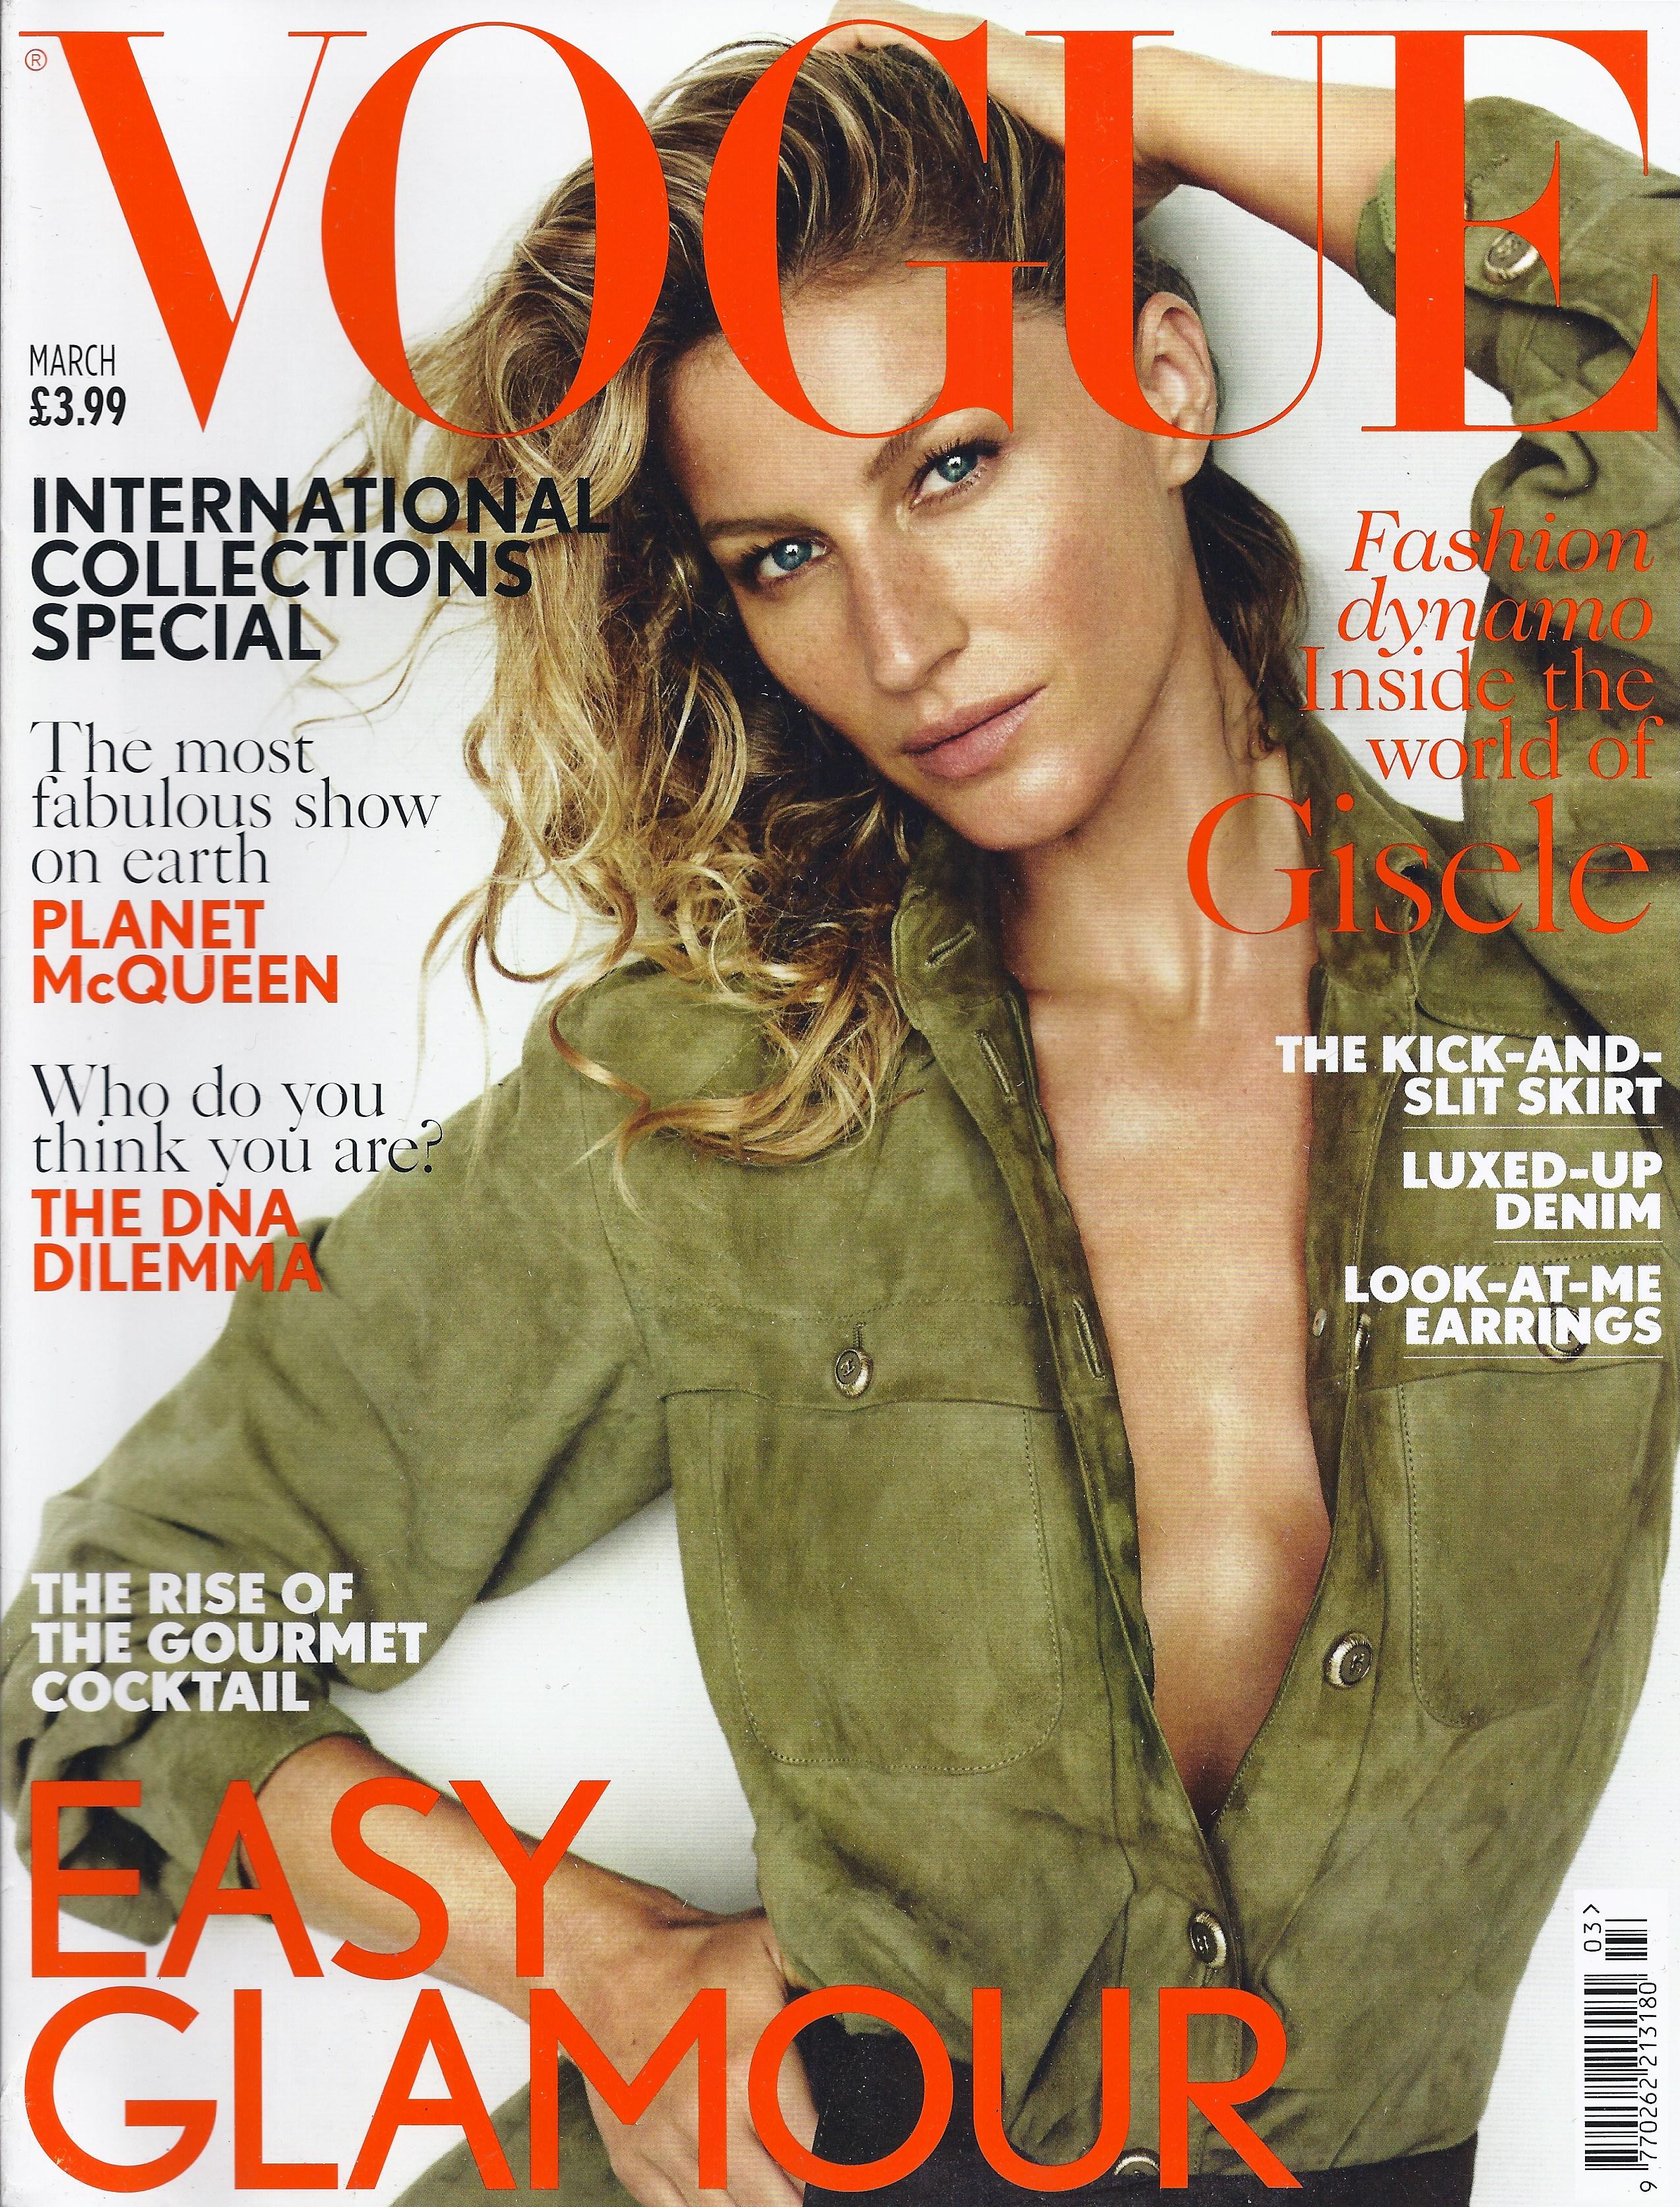 Vogue March 2015